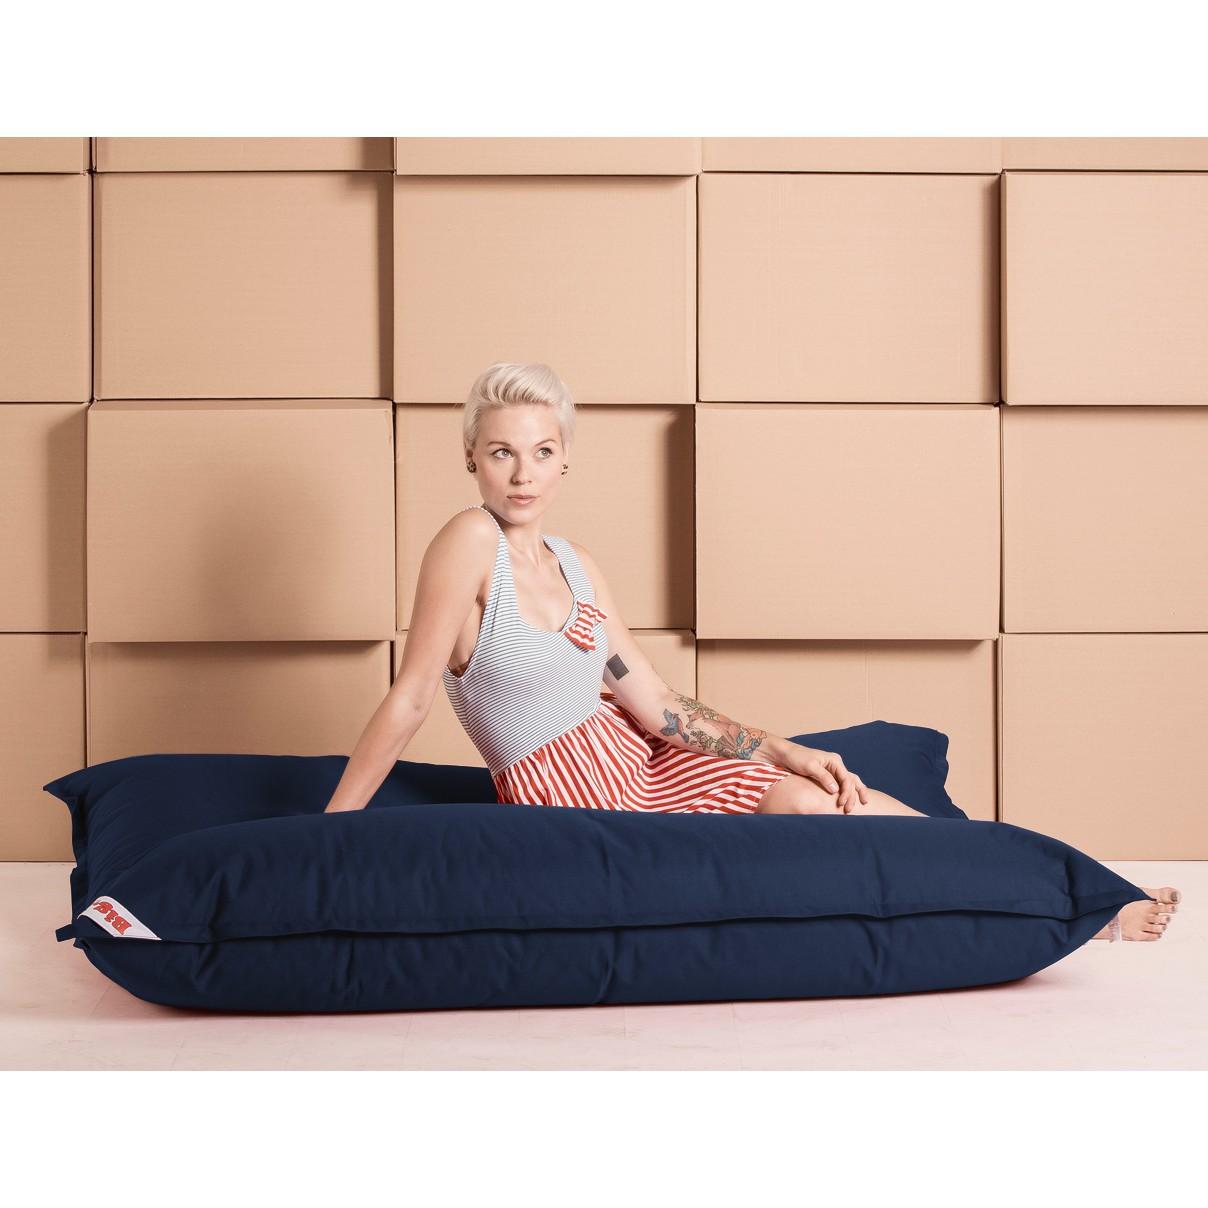 home24 SITTING POINT Sitzsack Big Bag Brava Jeansblau Flachgewebe 125x155x20 cm (BxHxT) | Wohnzimmer > Sessel